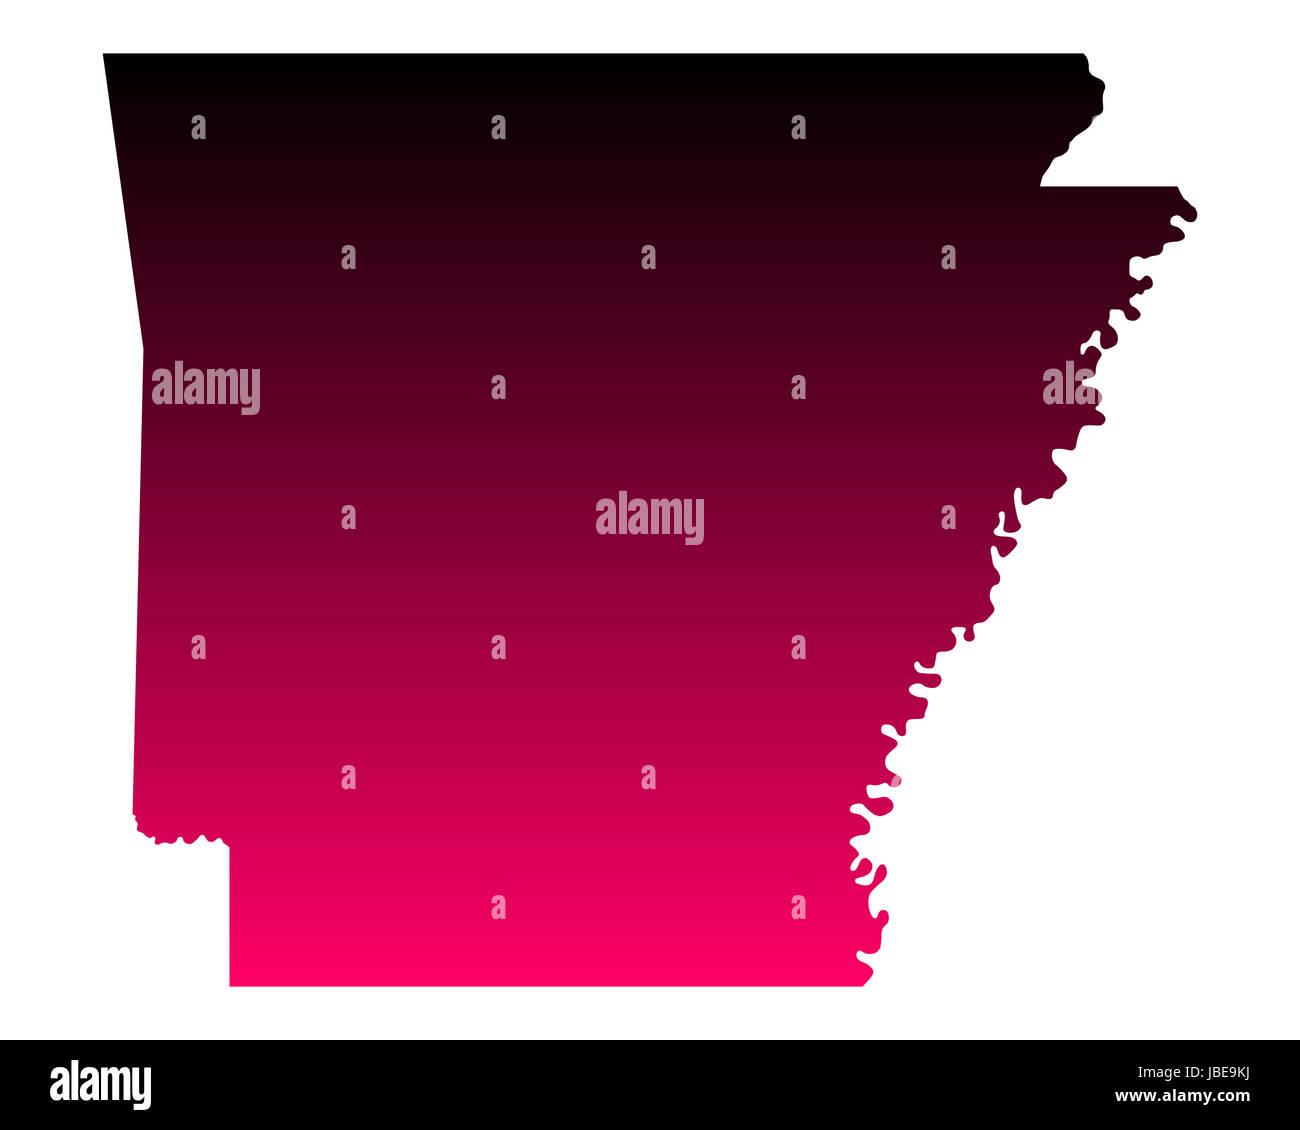 Karte von Arkansas - Stock Image